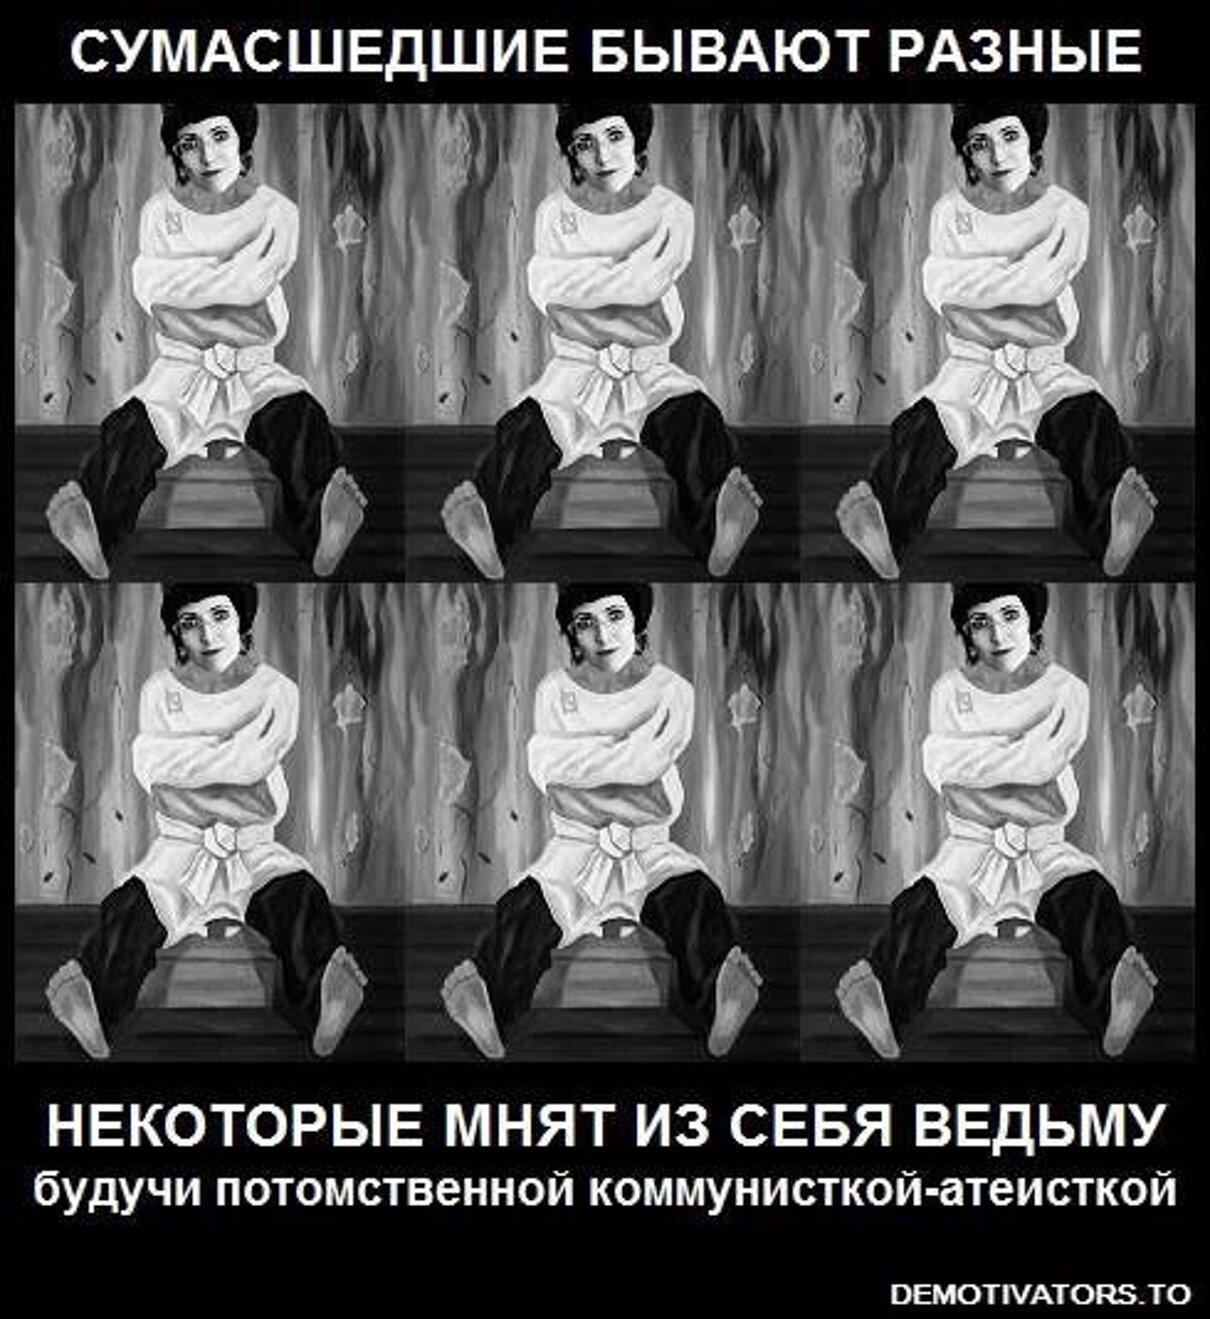 Жалоба-отзыв: Октябрина Жемчужина - Октябрина Жемчужина - мошенница!.  Фото №2